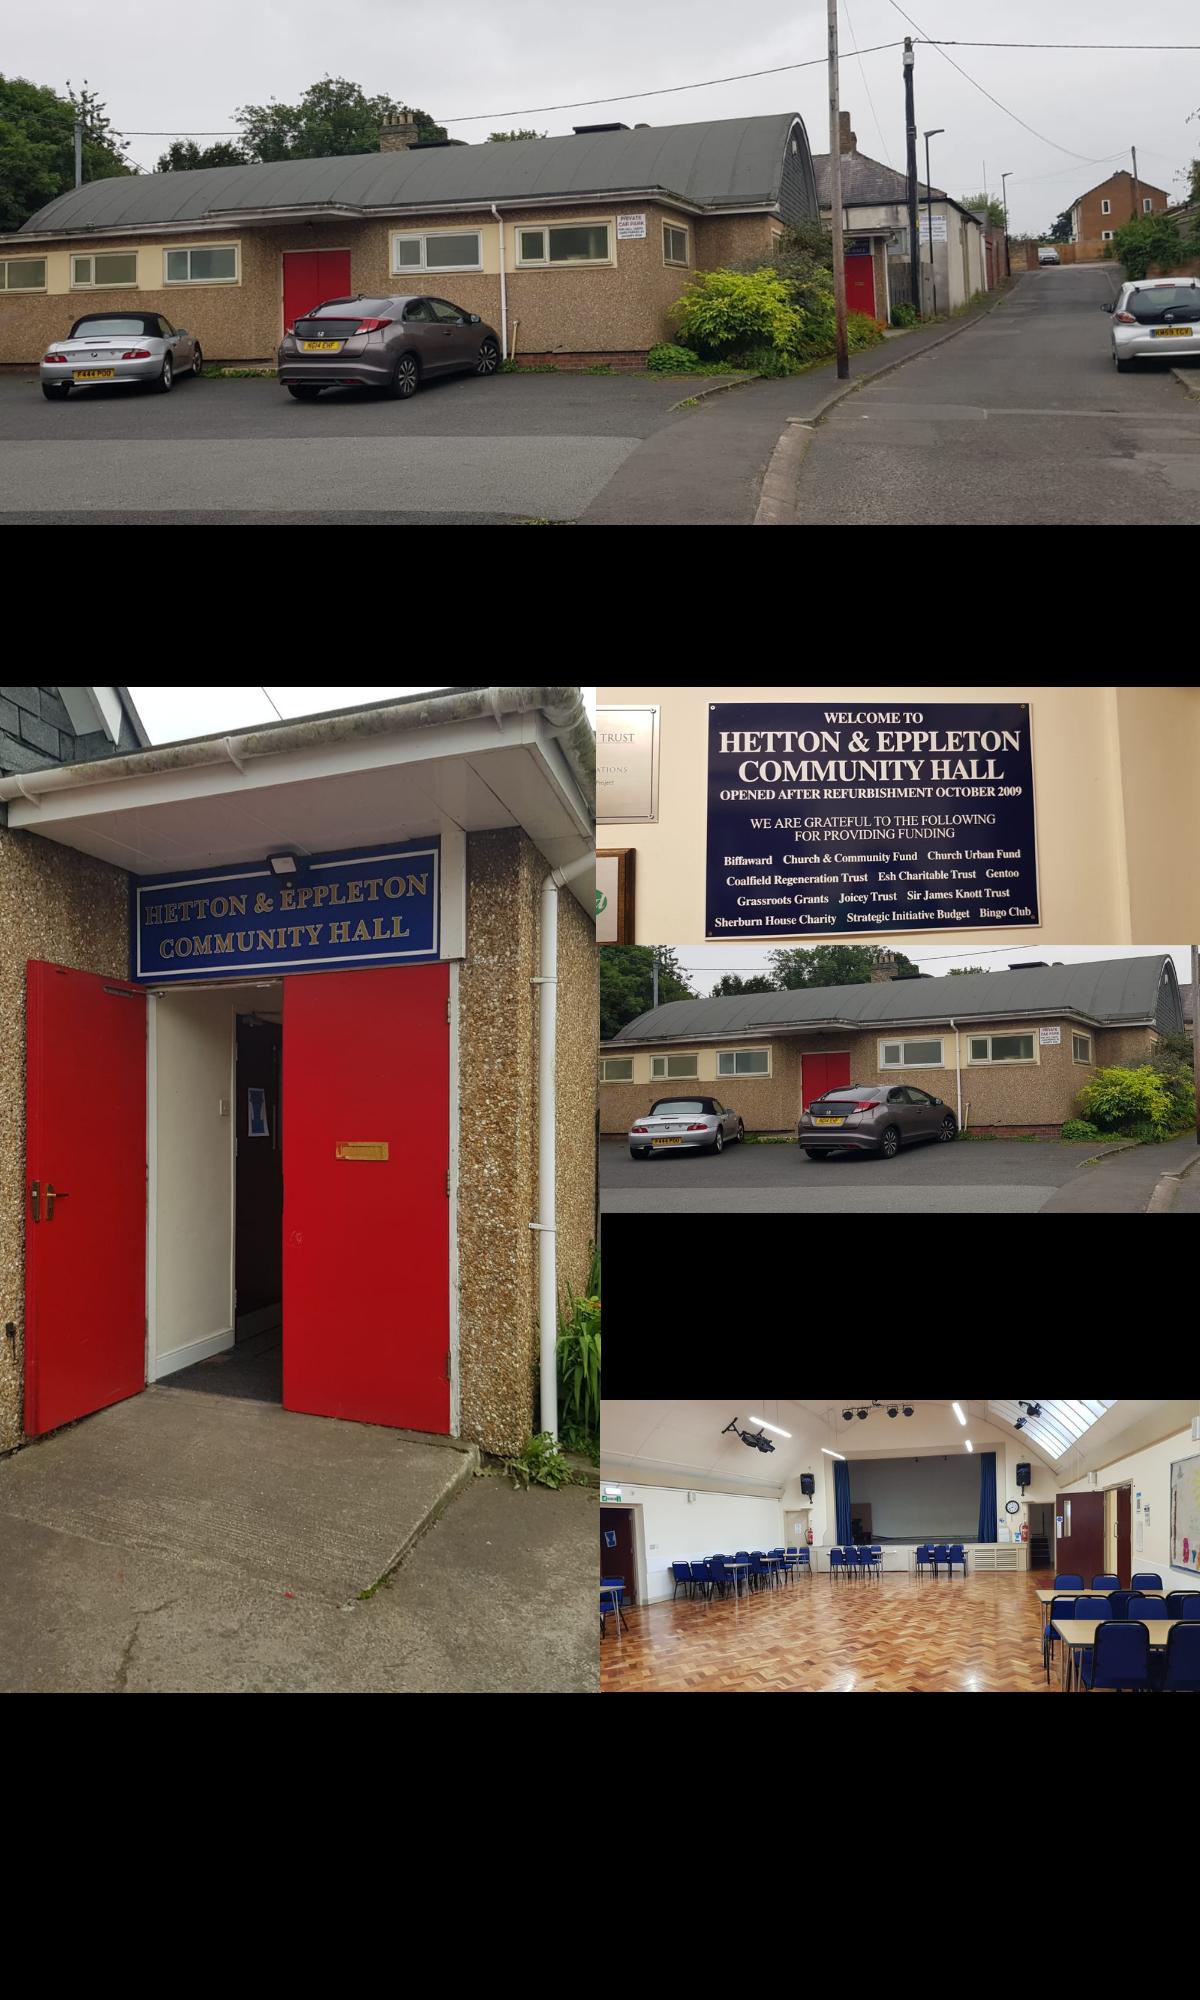 Hetton and Eppleton Community Centre